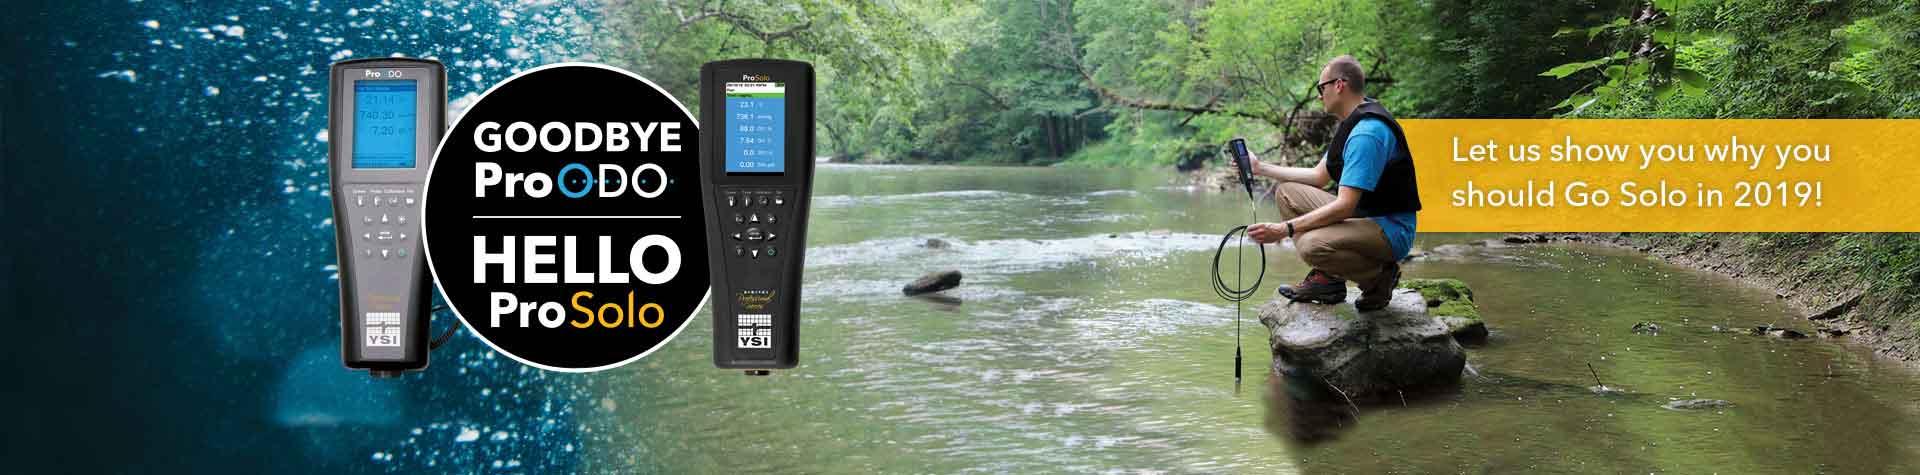 Ysi Water Quality Sampling And Monitoring Meters Instruments Mobil Home Air Handler Wiring Diagram Next Generation Odo Meter